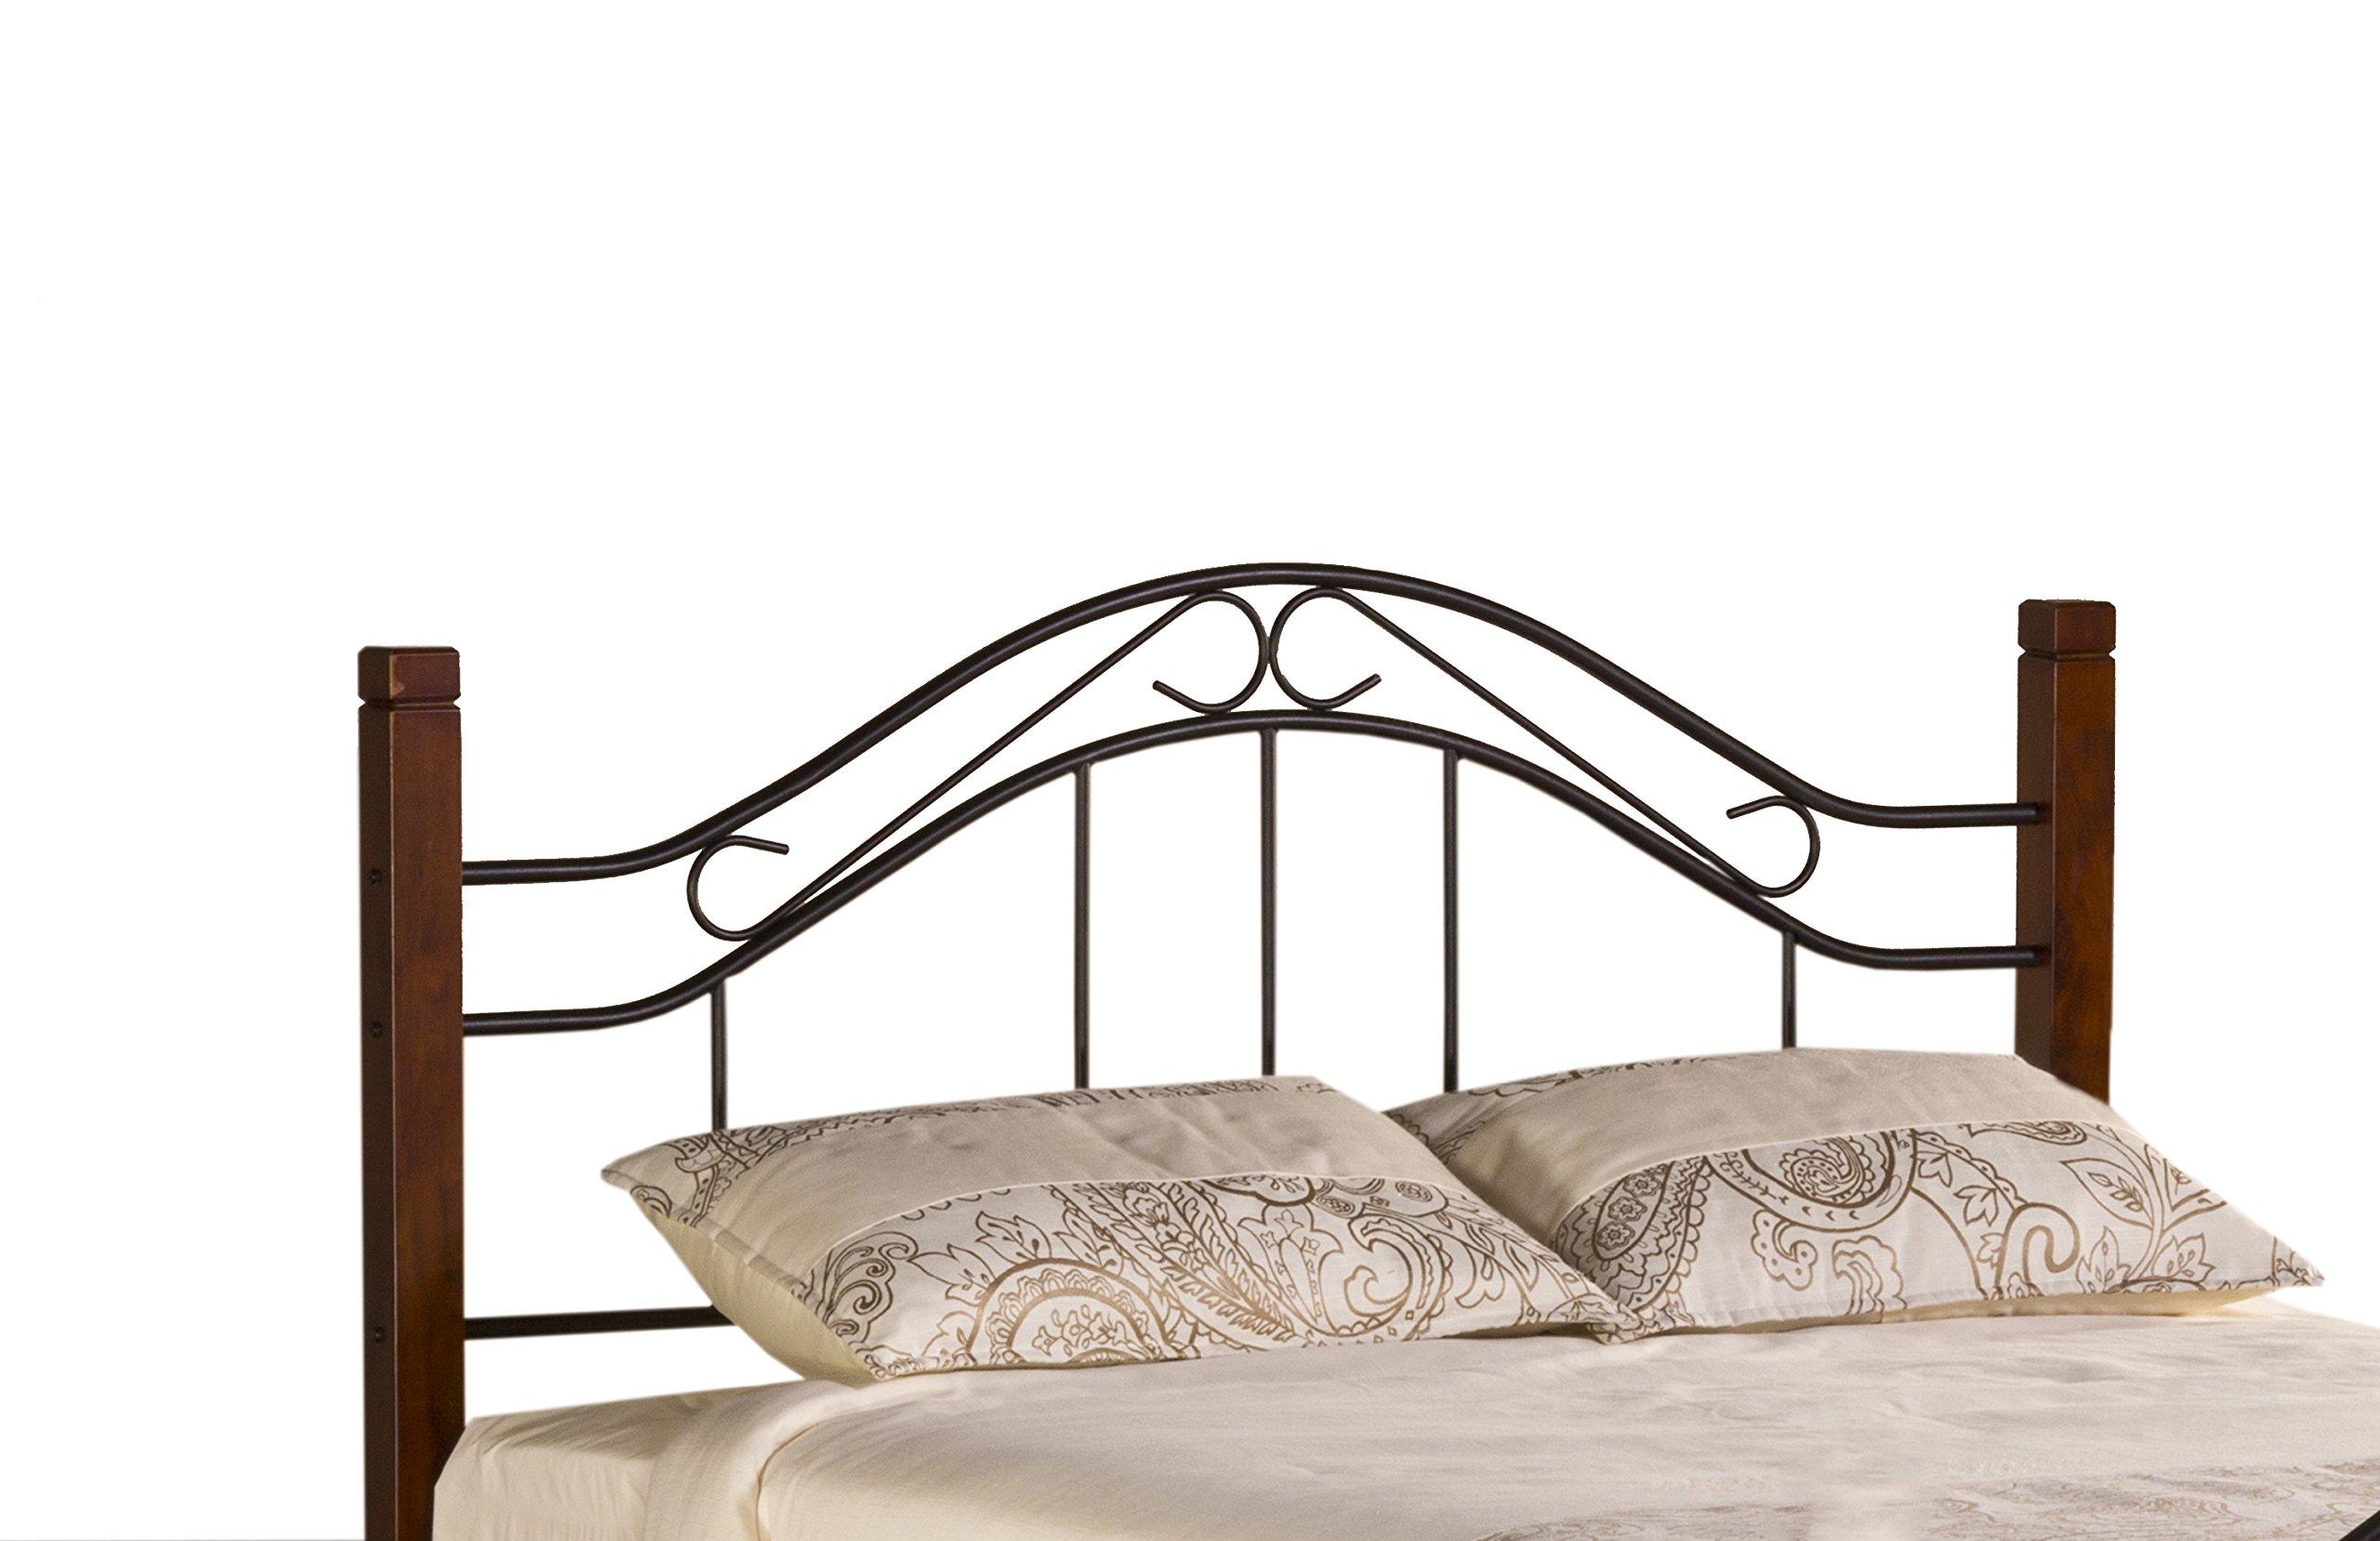 Hillsdale Furniture 1159HFQ Matson Headboard, Full/Queen, Cherry/Black by Hillsdale Furniture